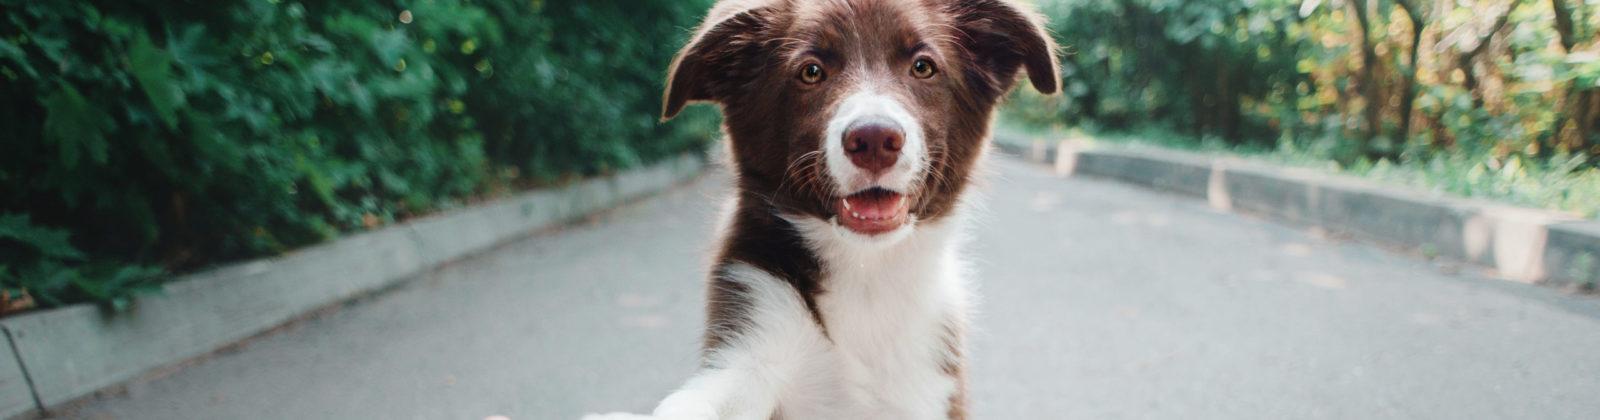 teenage puppy adolescence dog